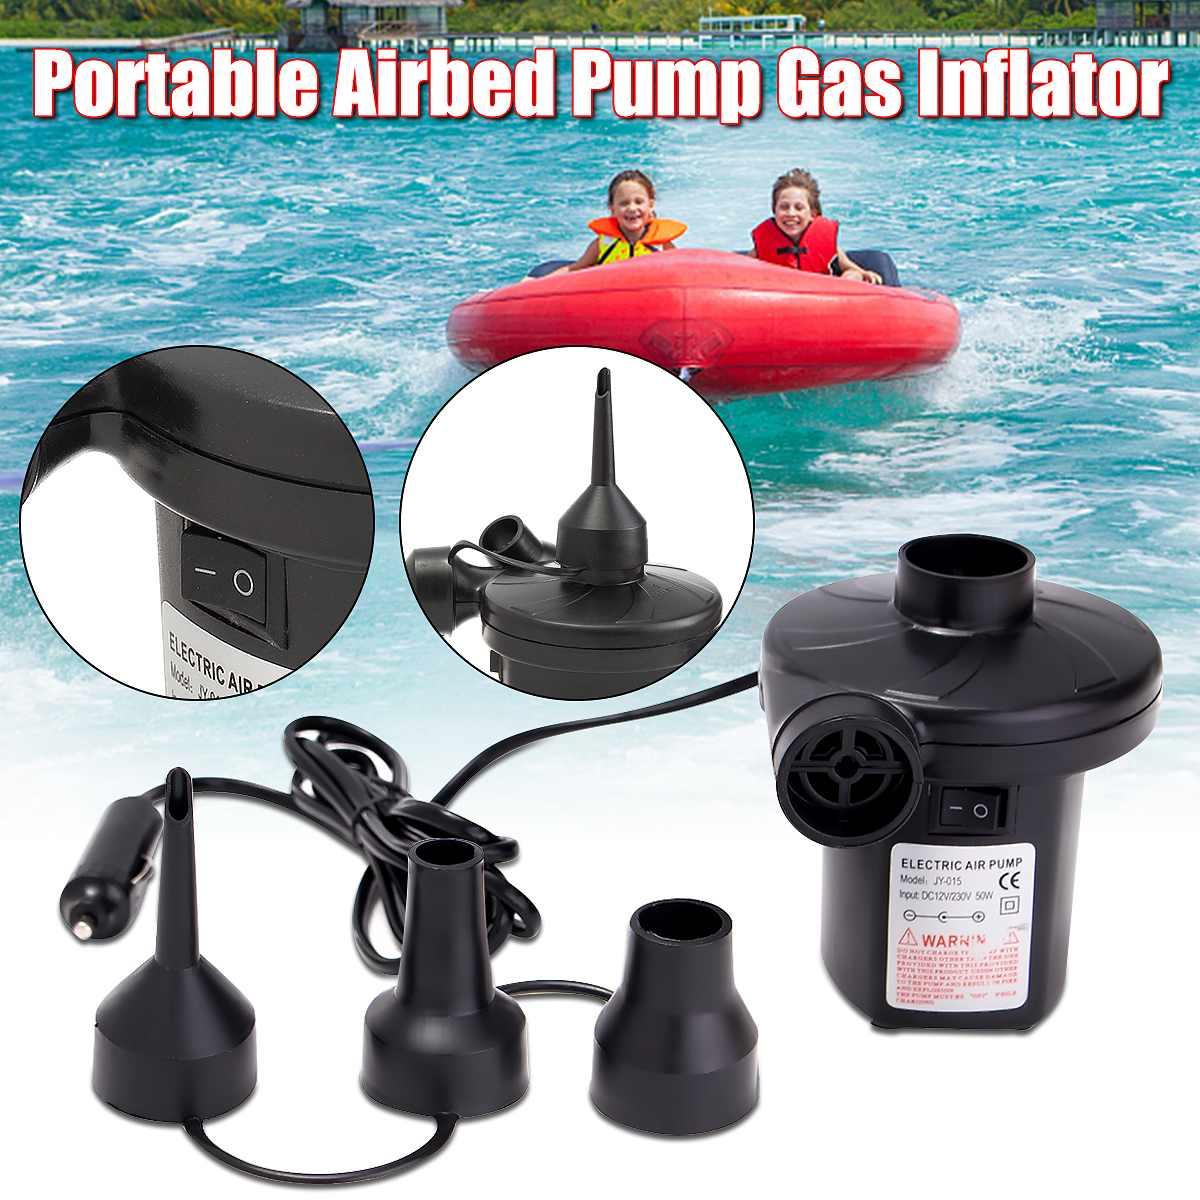 2 in 1 Electric Air Pump Inflator Pool Camping Bed Mattress Boat 12V 240V Car UK